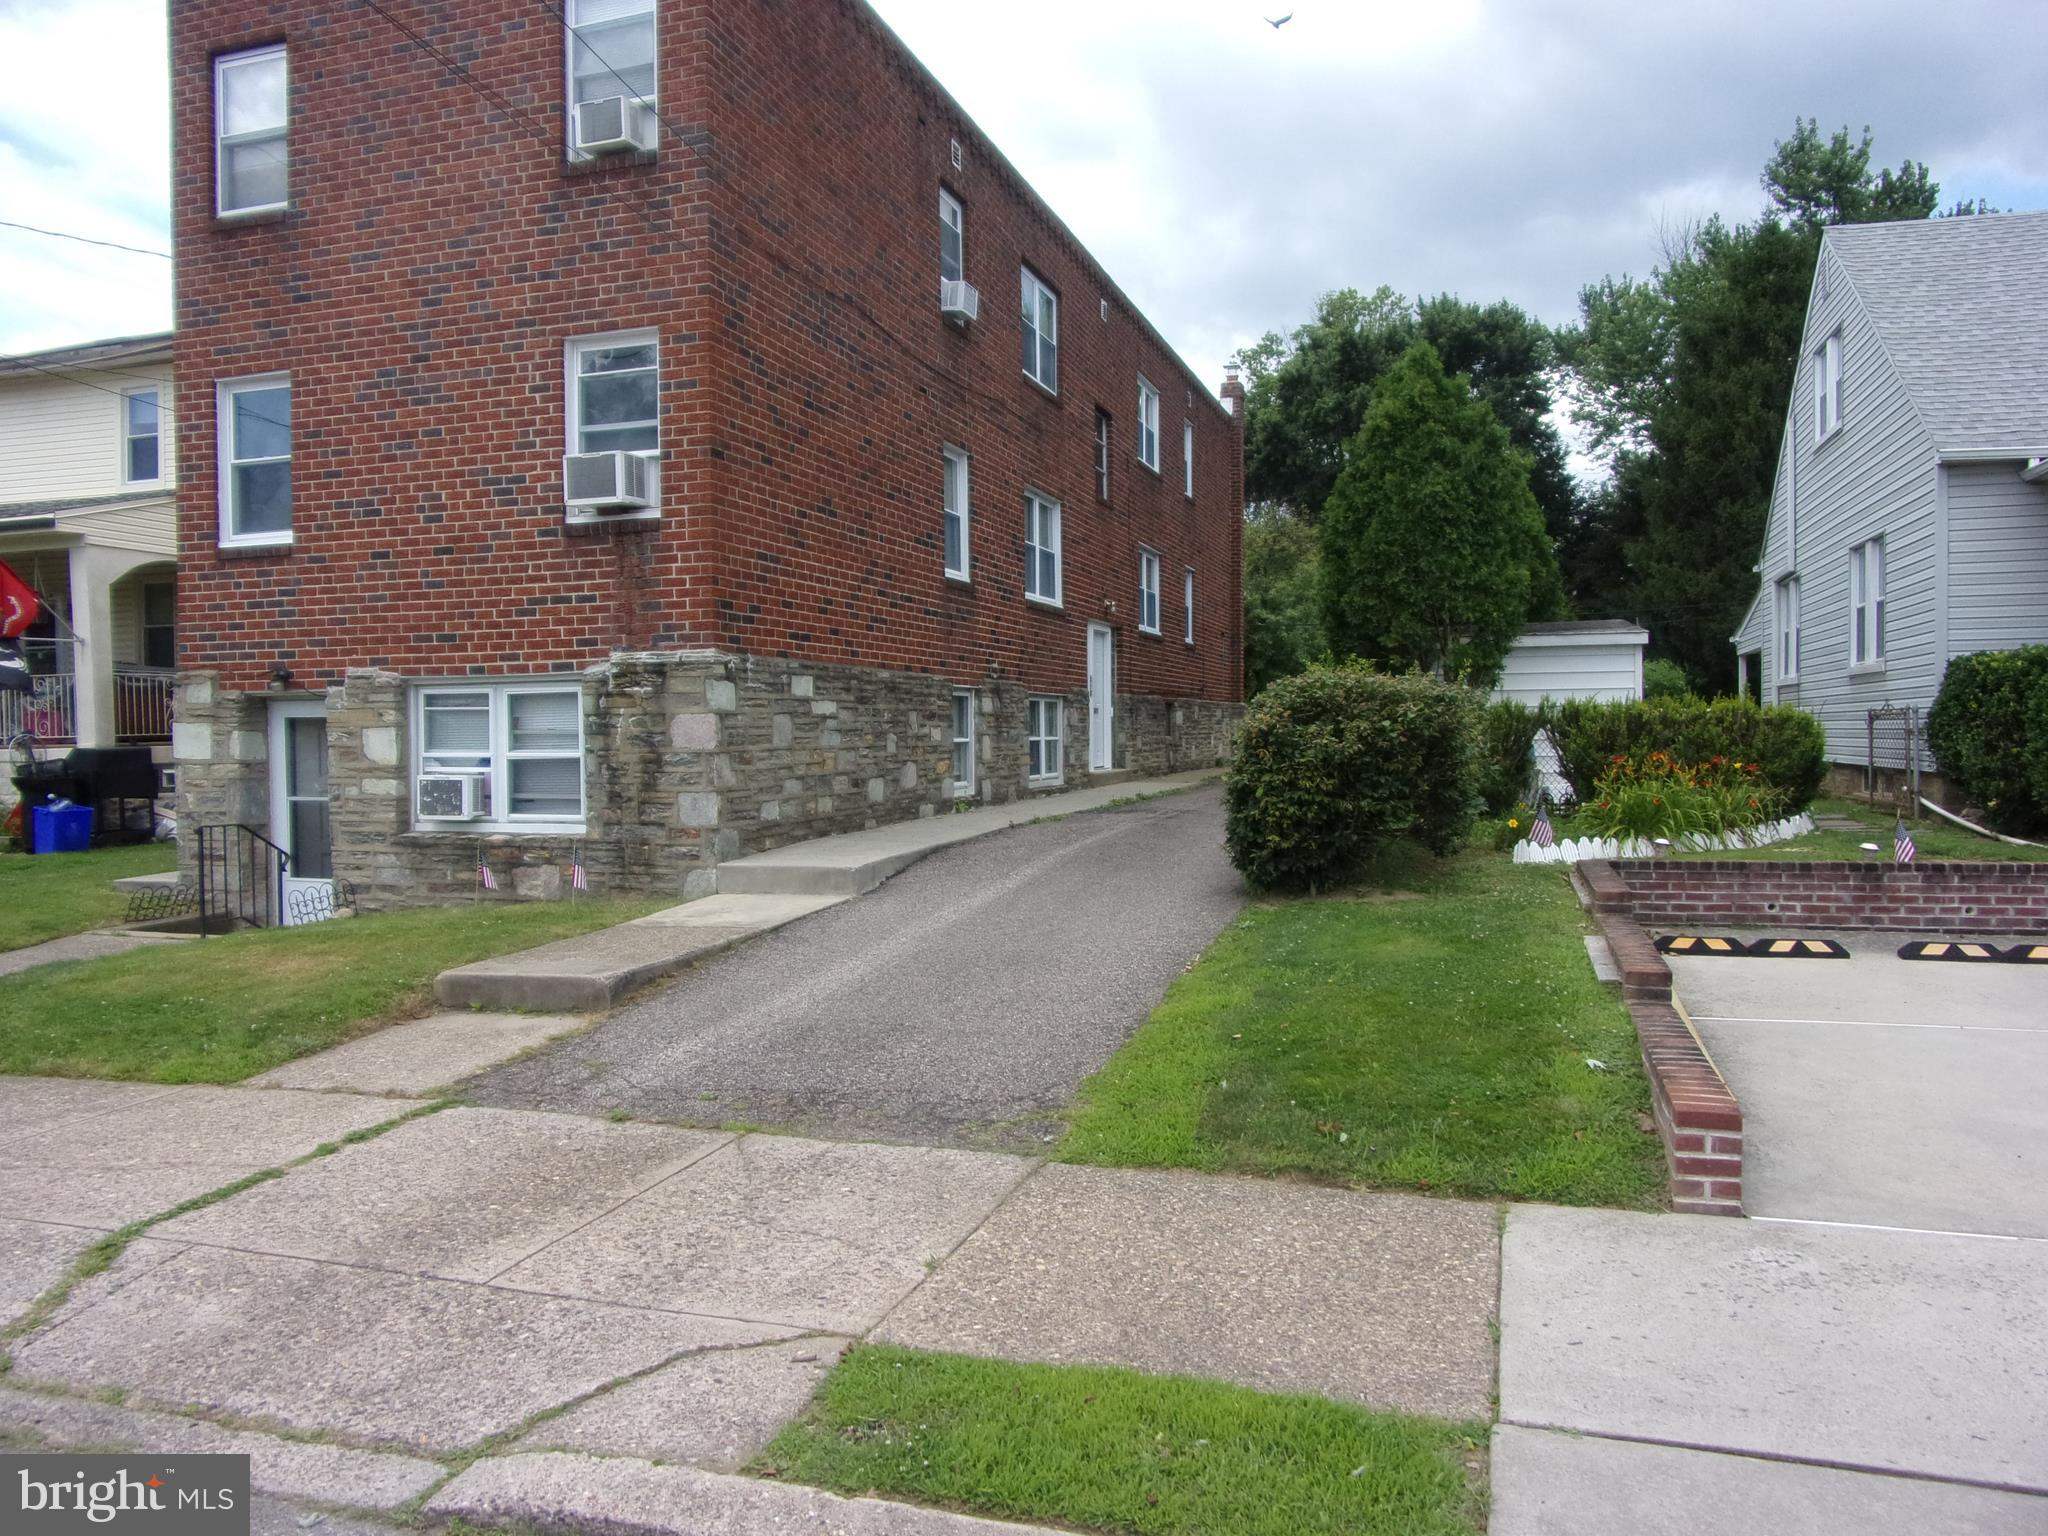 7712 WATSON STREET, PHILADELPHIA, PA 19111